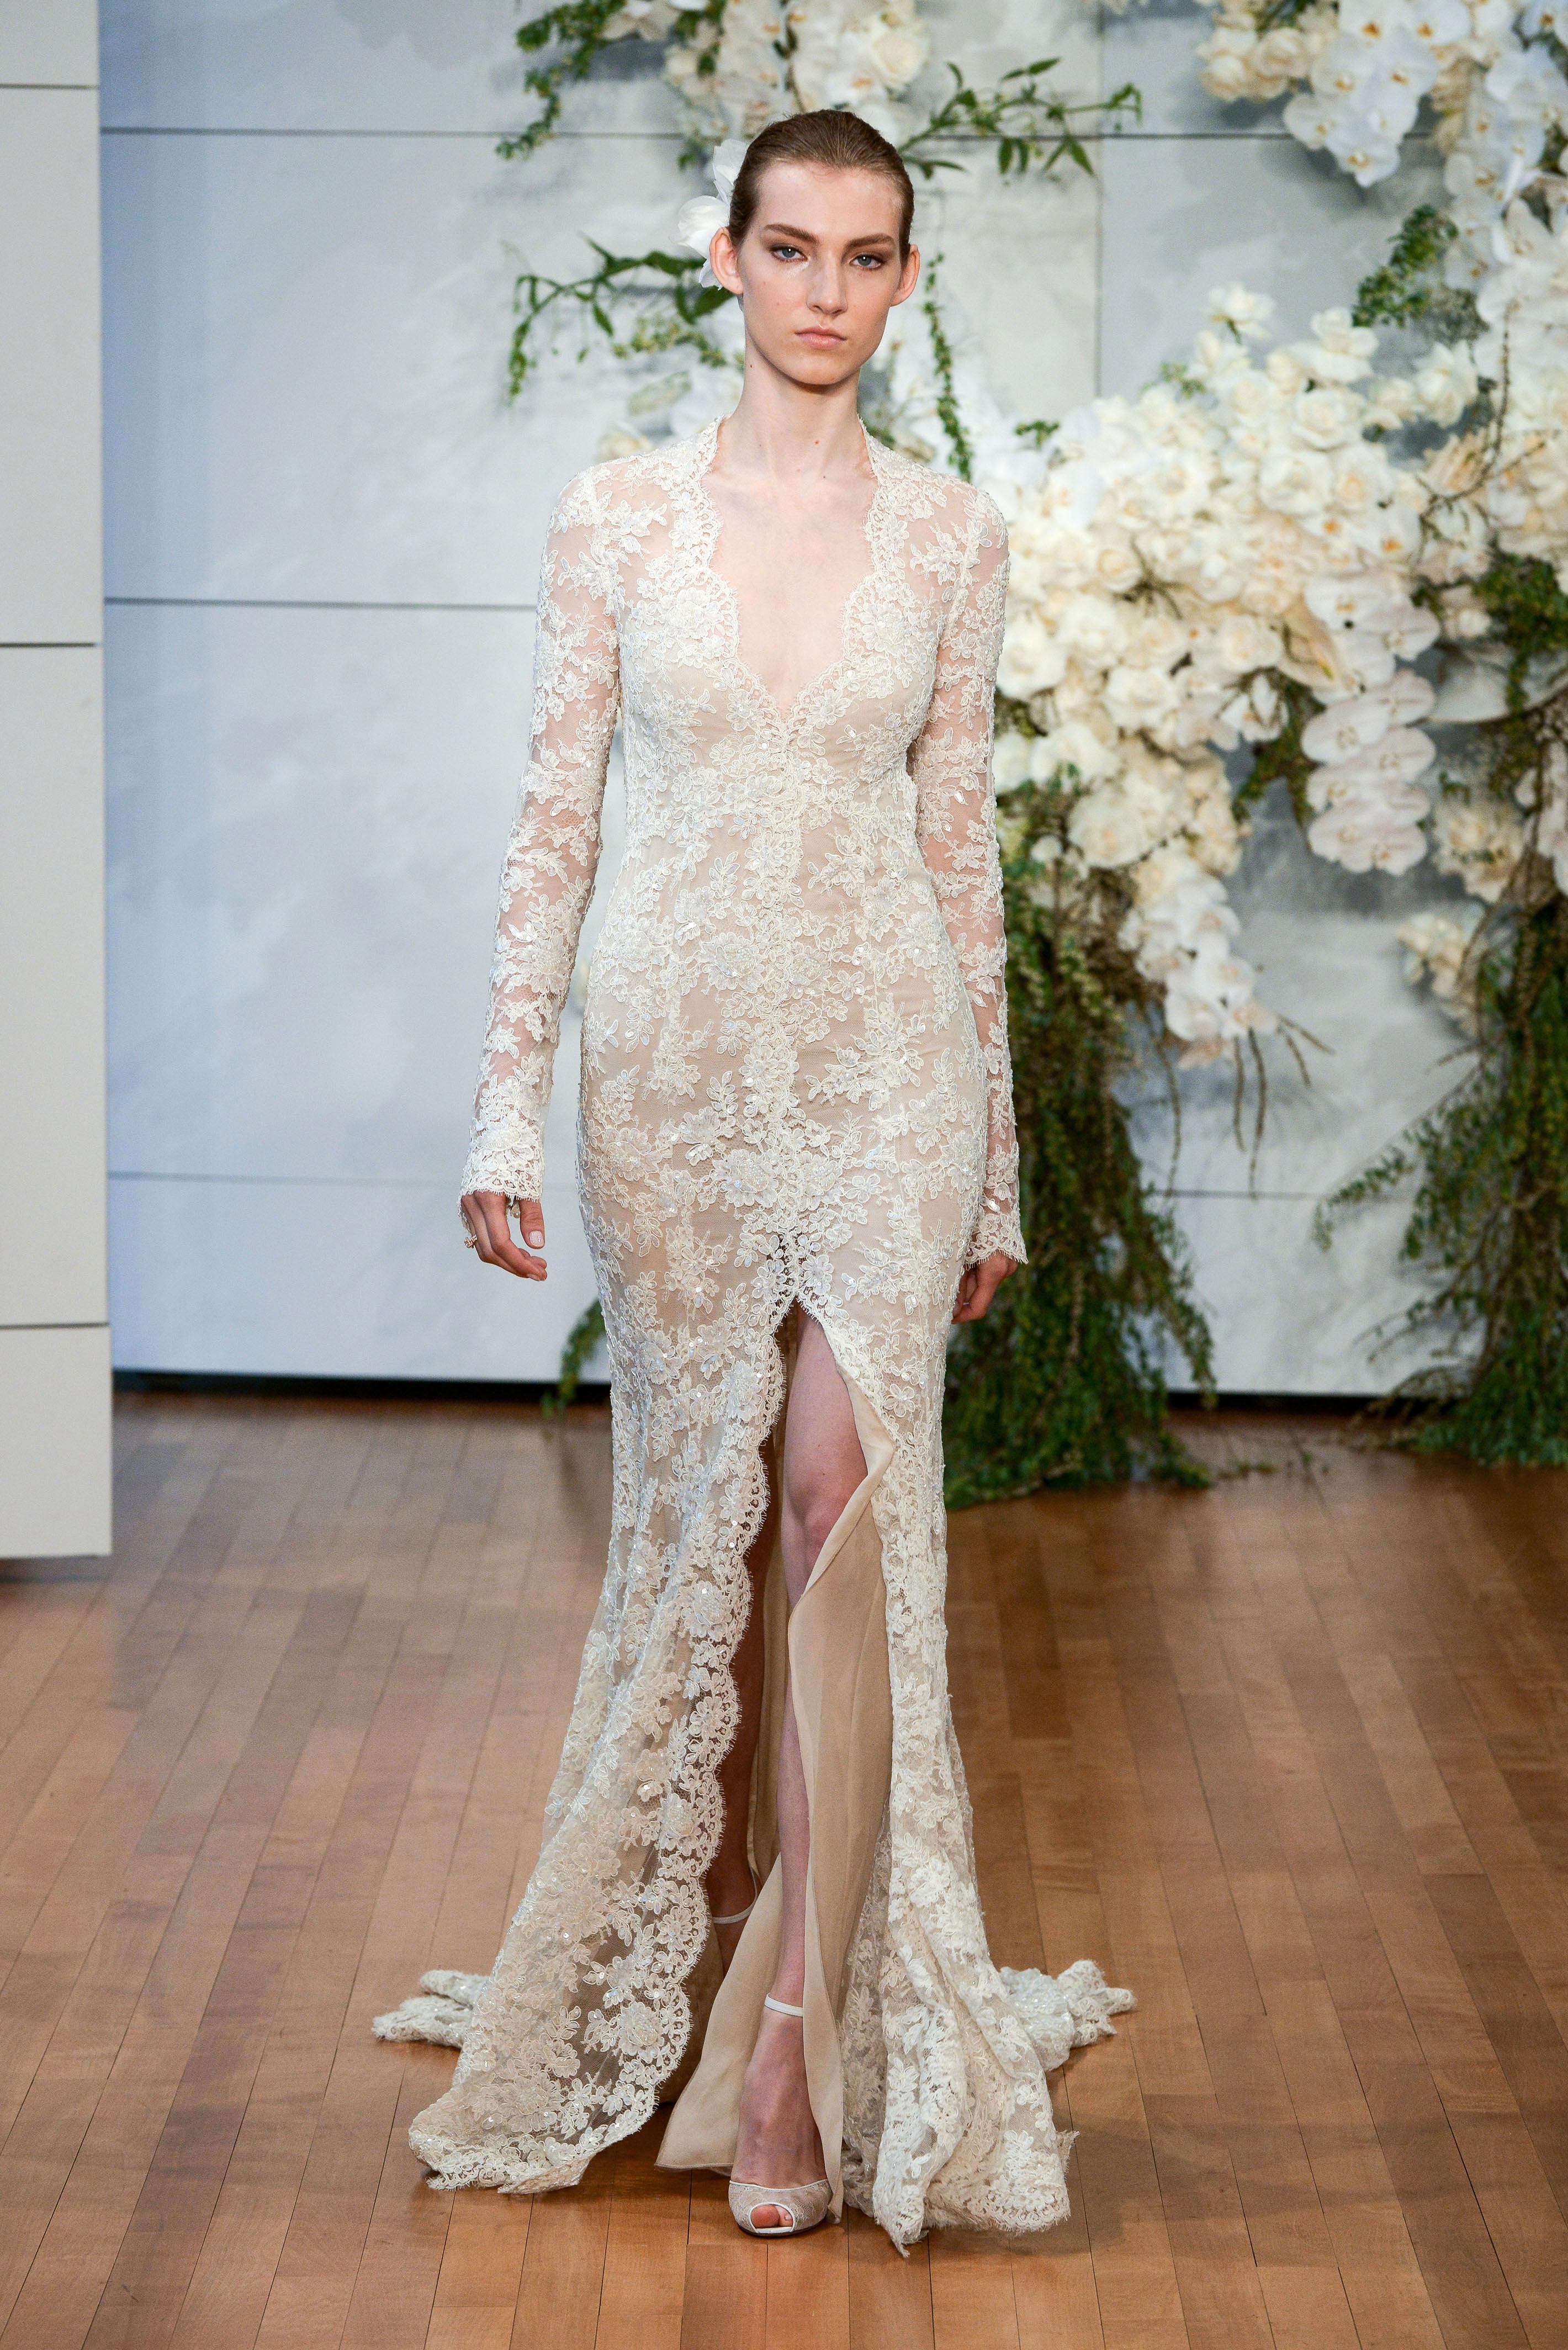 monique lhuillier long sleeves v-neck lace wedding dress spring 2018